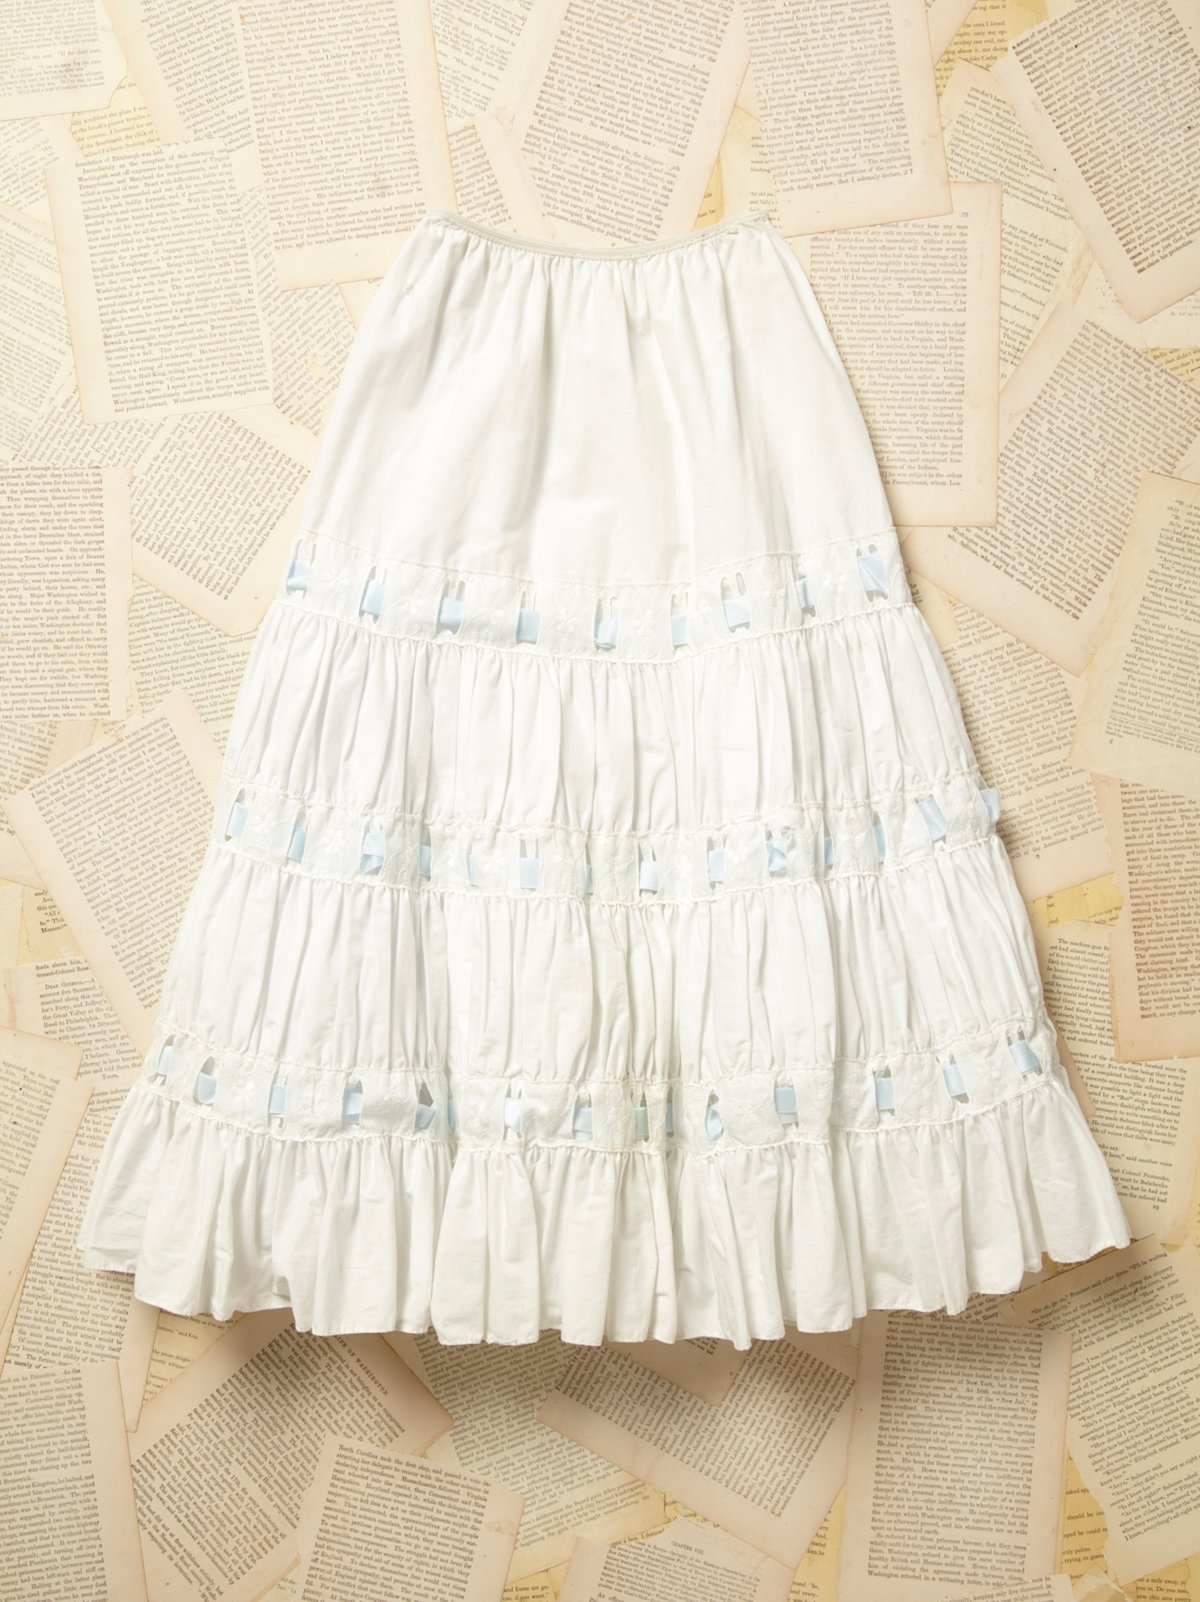 Vintage 1950s White Cotton Petticoat